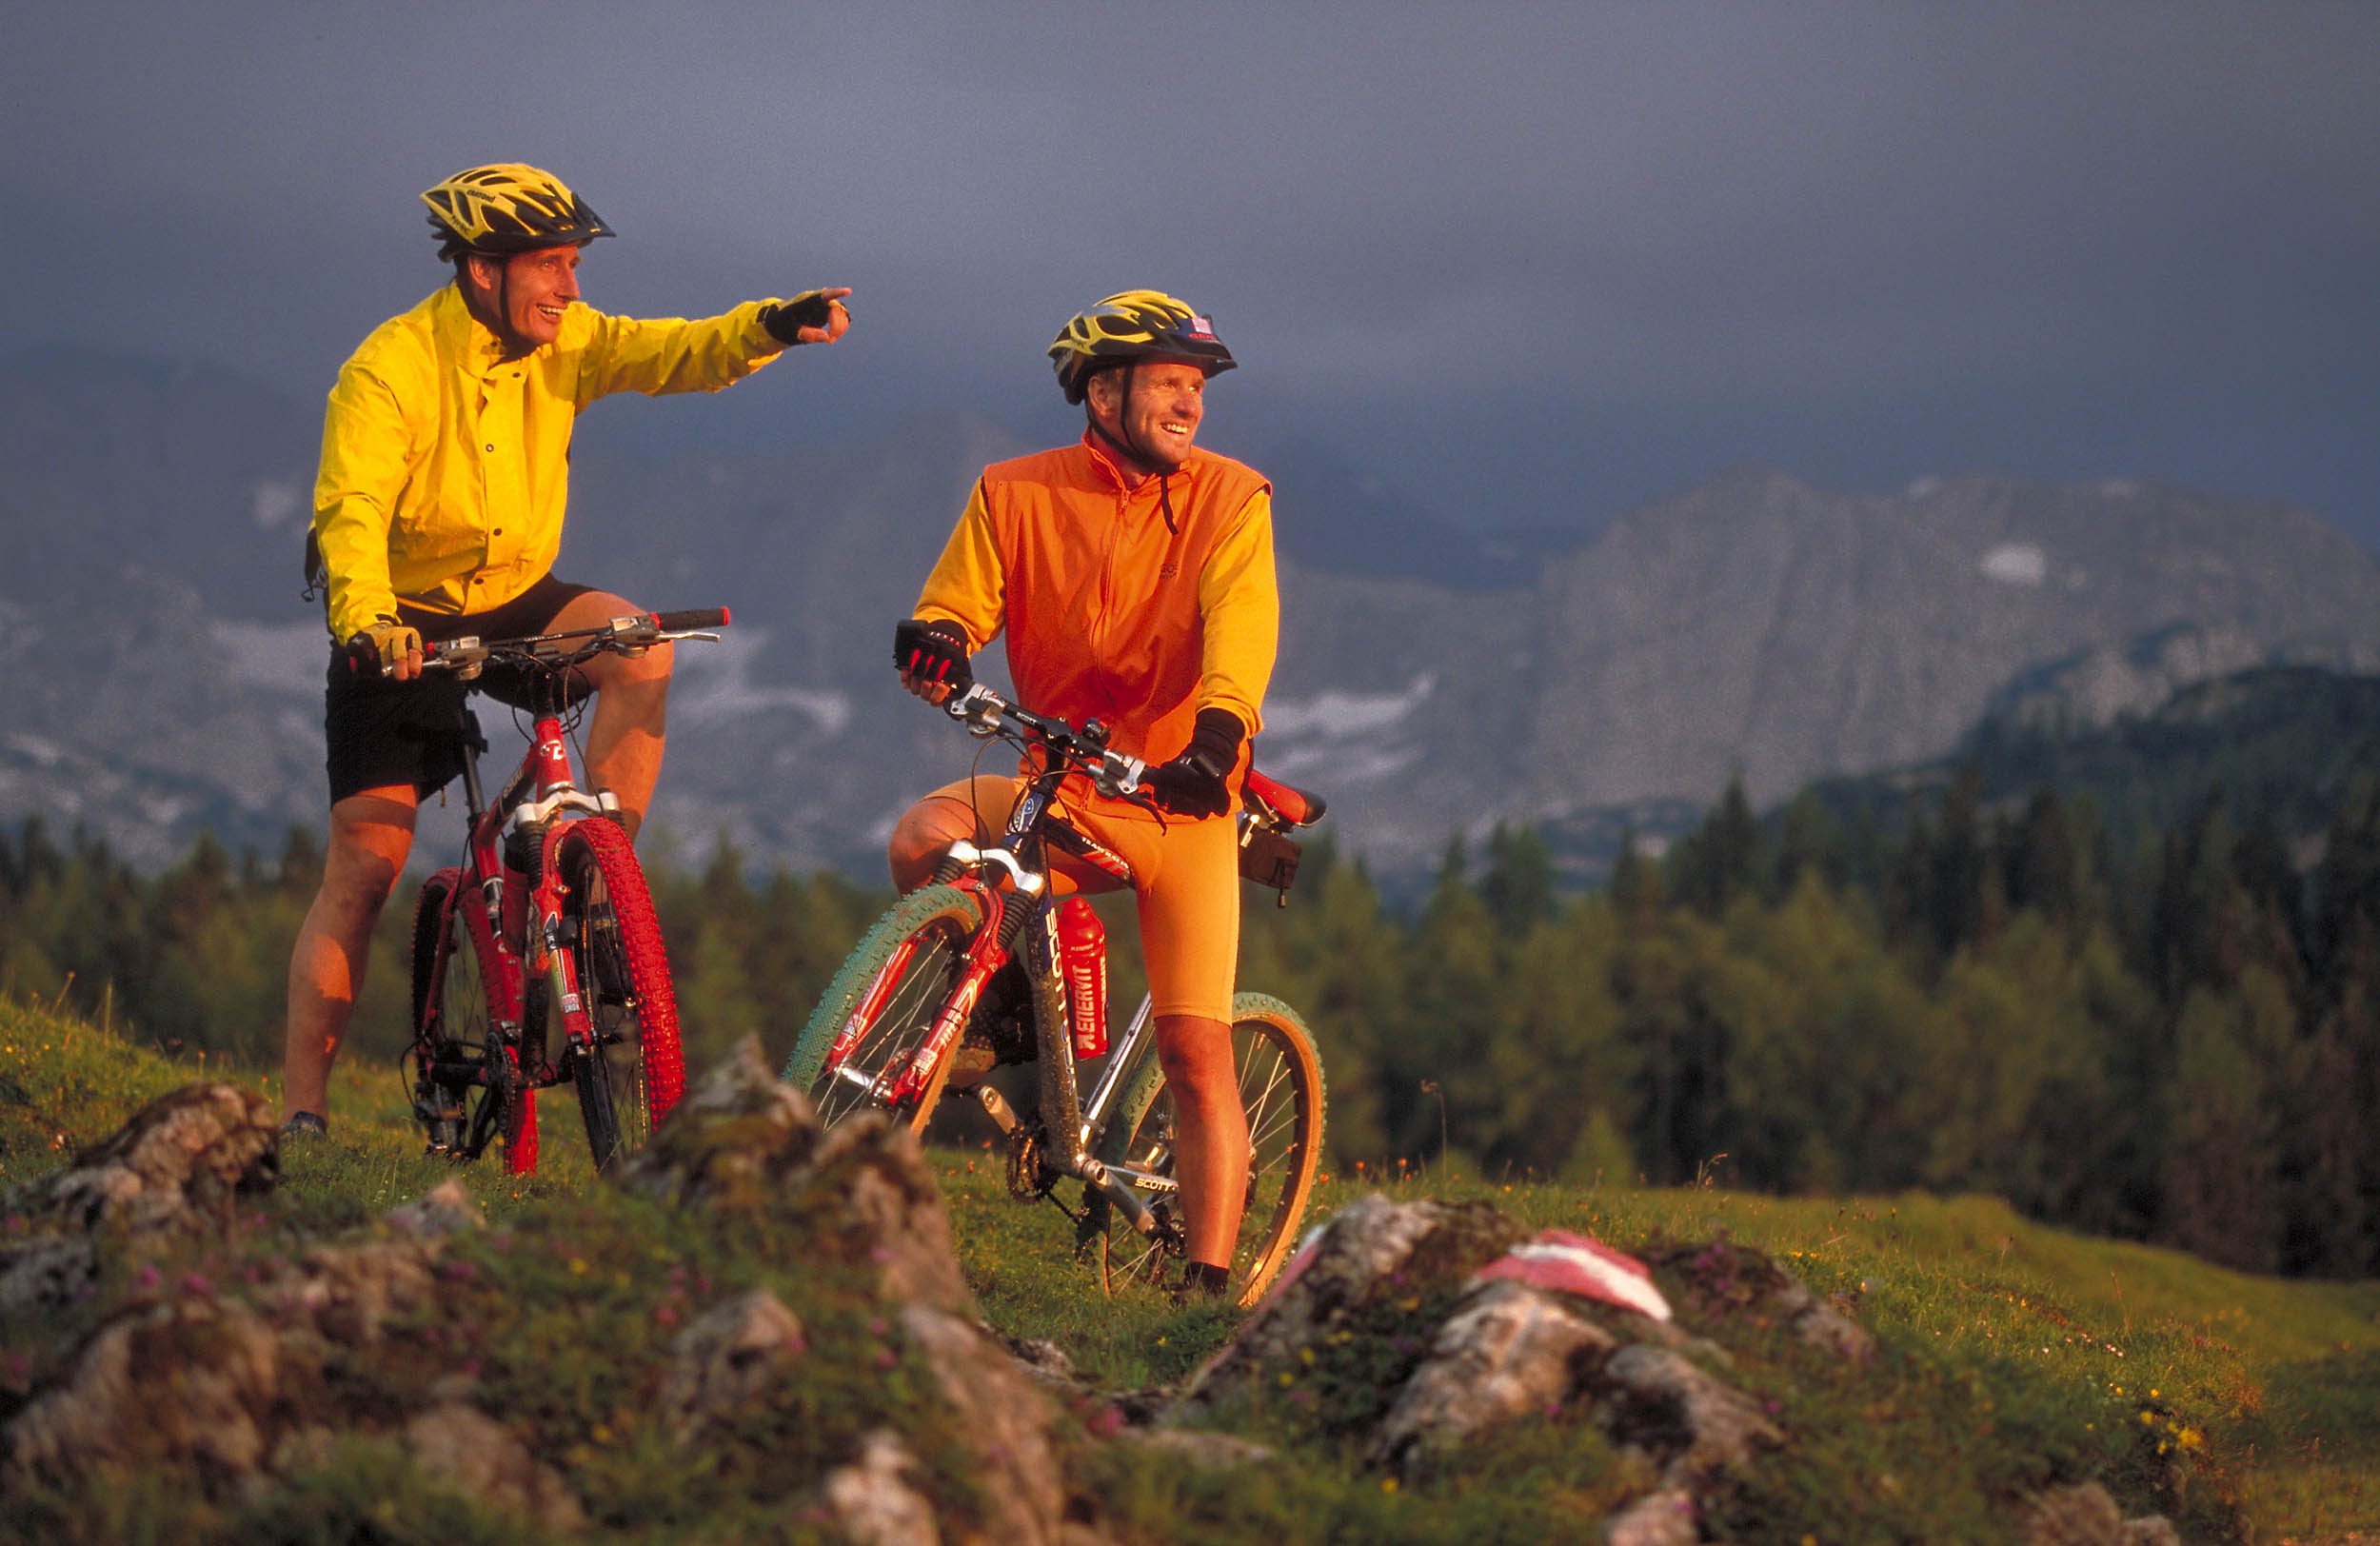 Rudi u Gerry bike new Img0032new bb_shp2500px_JPGQU7mittel_370KB_real421KB.jpg